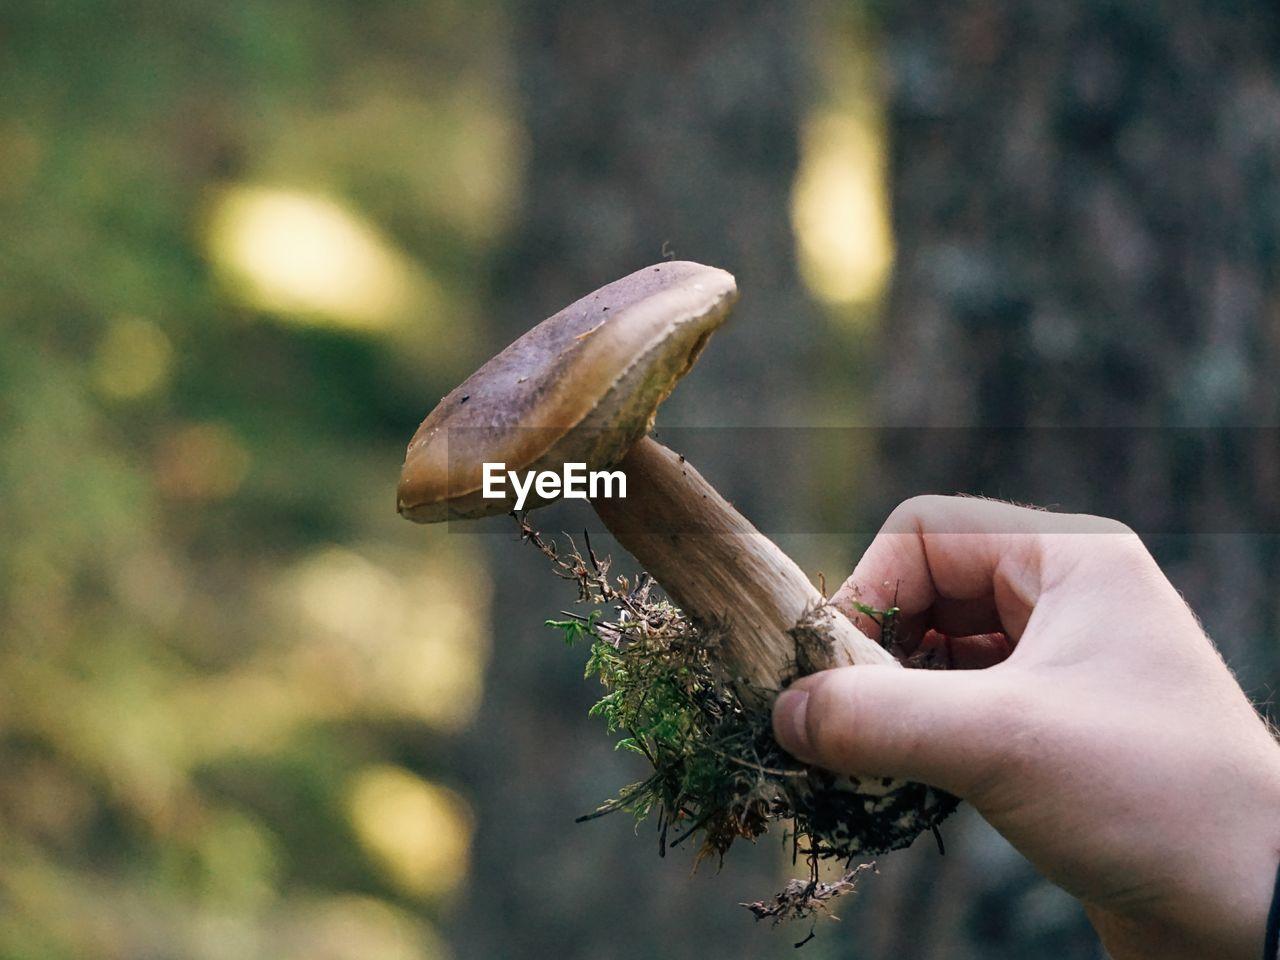 Cropped Hand Holding Edible Mushroom